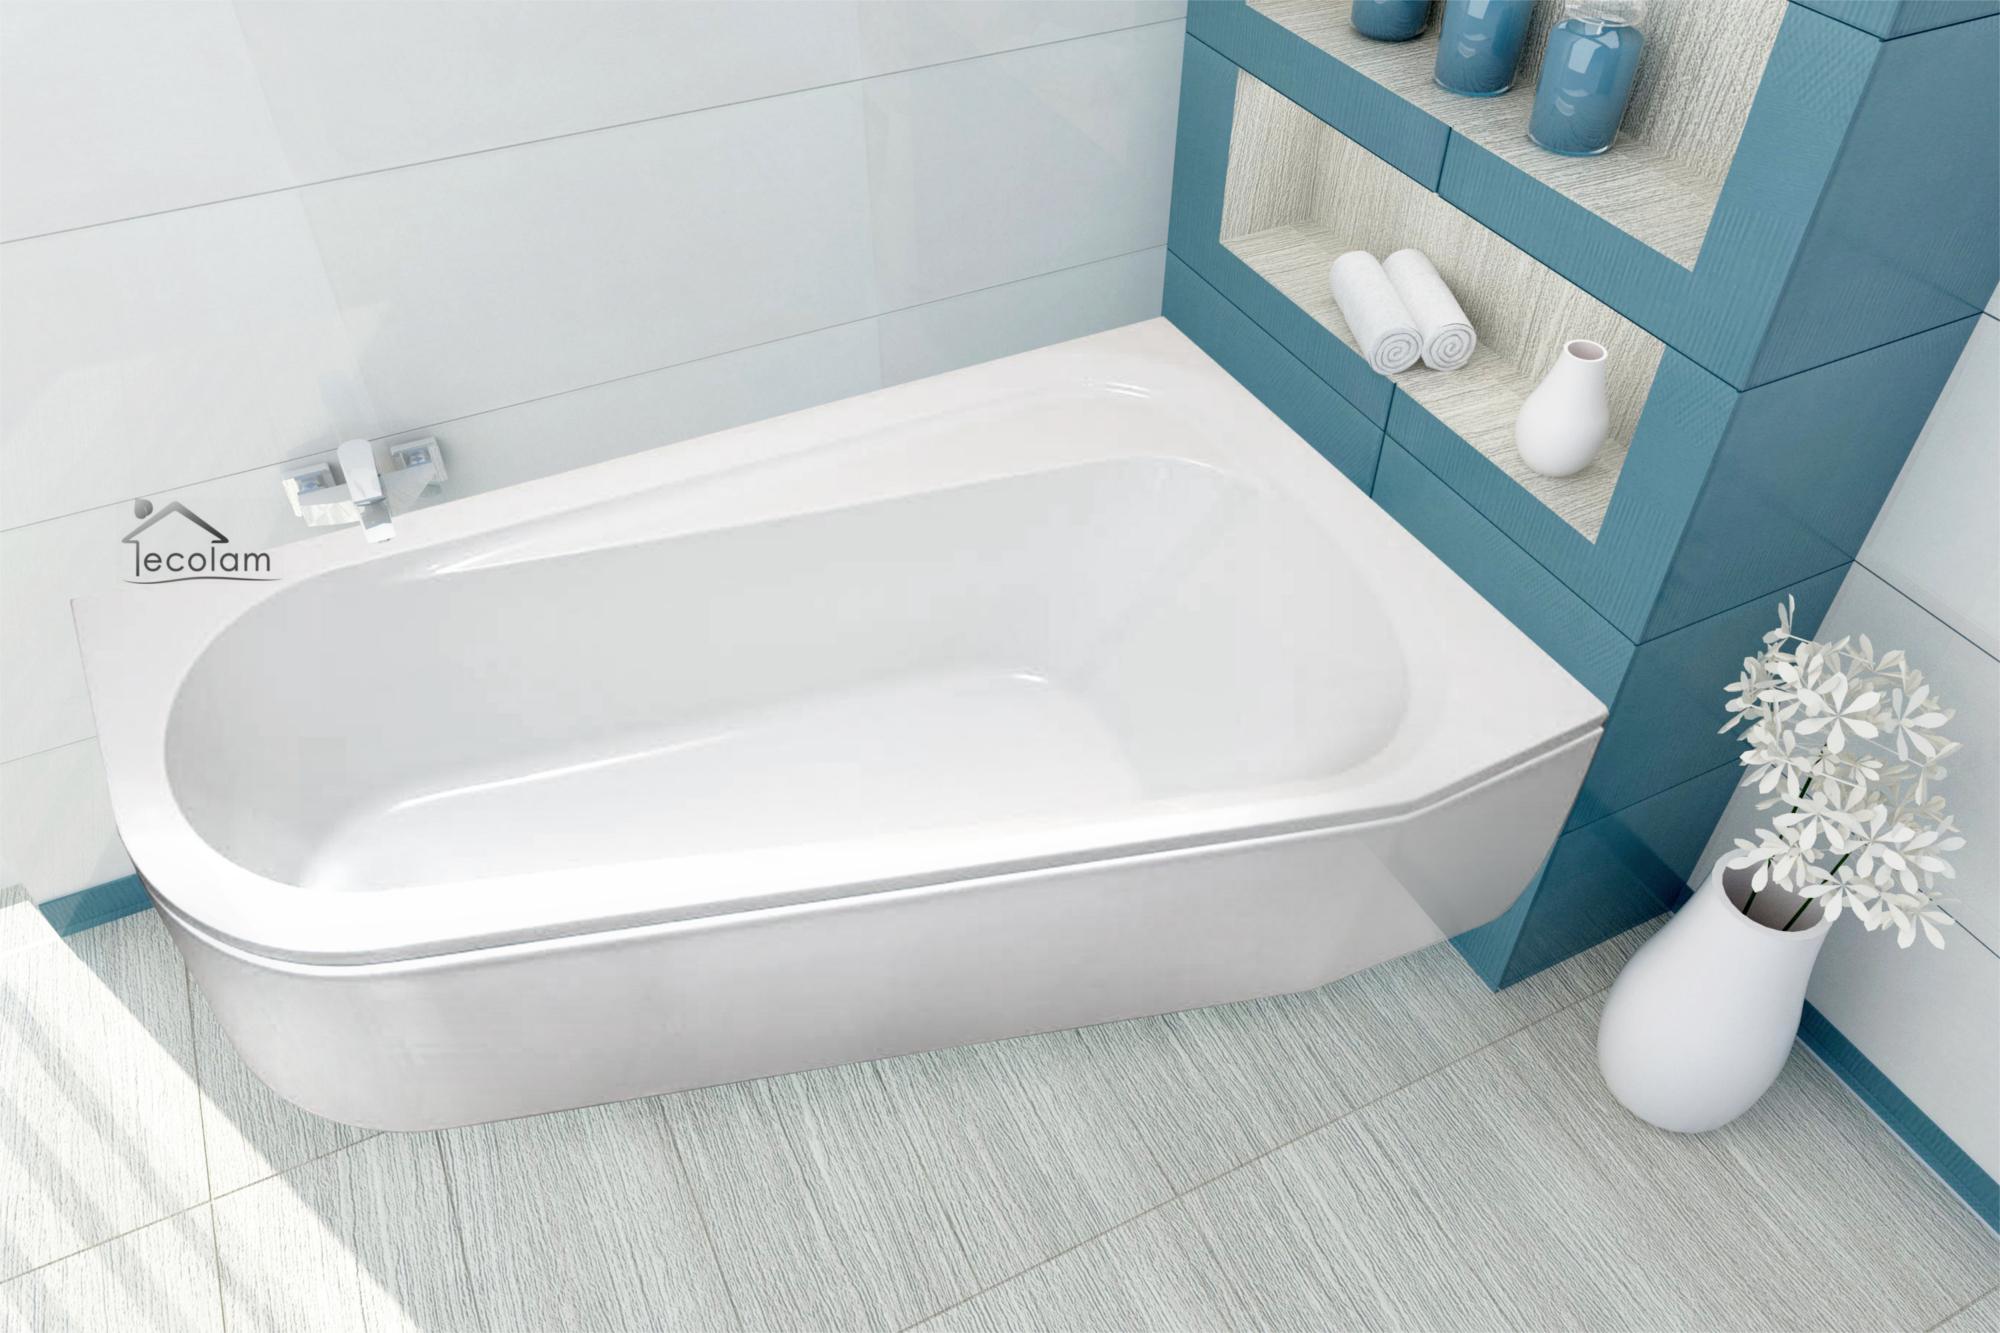 badewanne wanne eckbadewanne 150 x 85 cm f e ab berlauf sch rze acryl rechts ebay. Black Bedroom Furniture Sets. Home Design Ideas